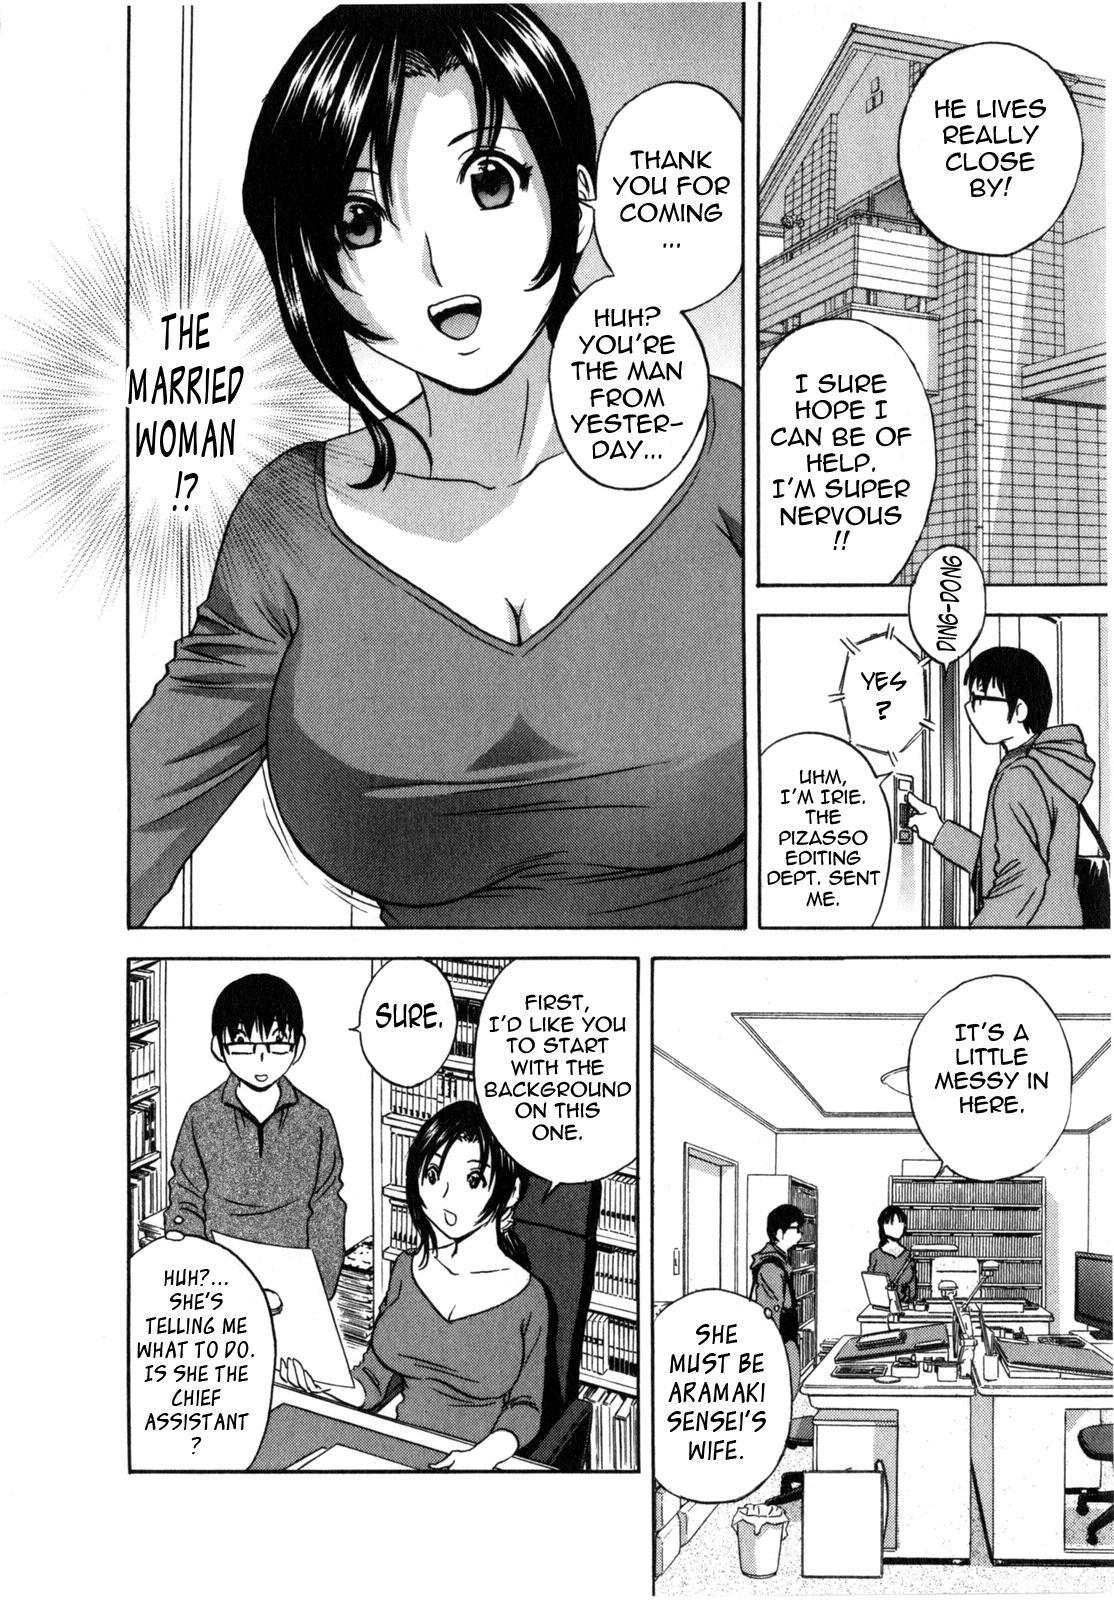 [Hidemaru] Life with Married Women Just Like a Manga 1 - Ch. 1-3 [English] {Tadanohito} 12